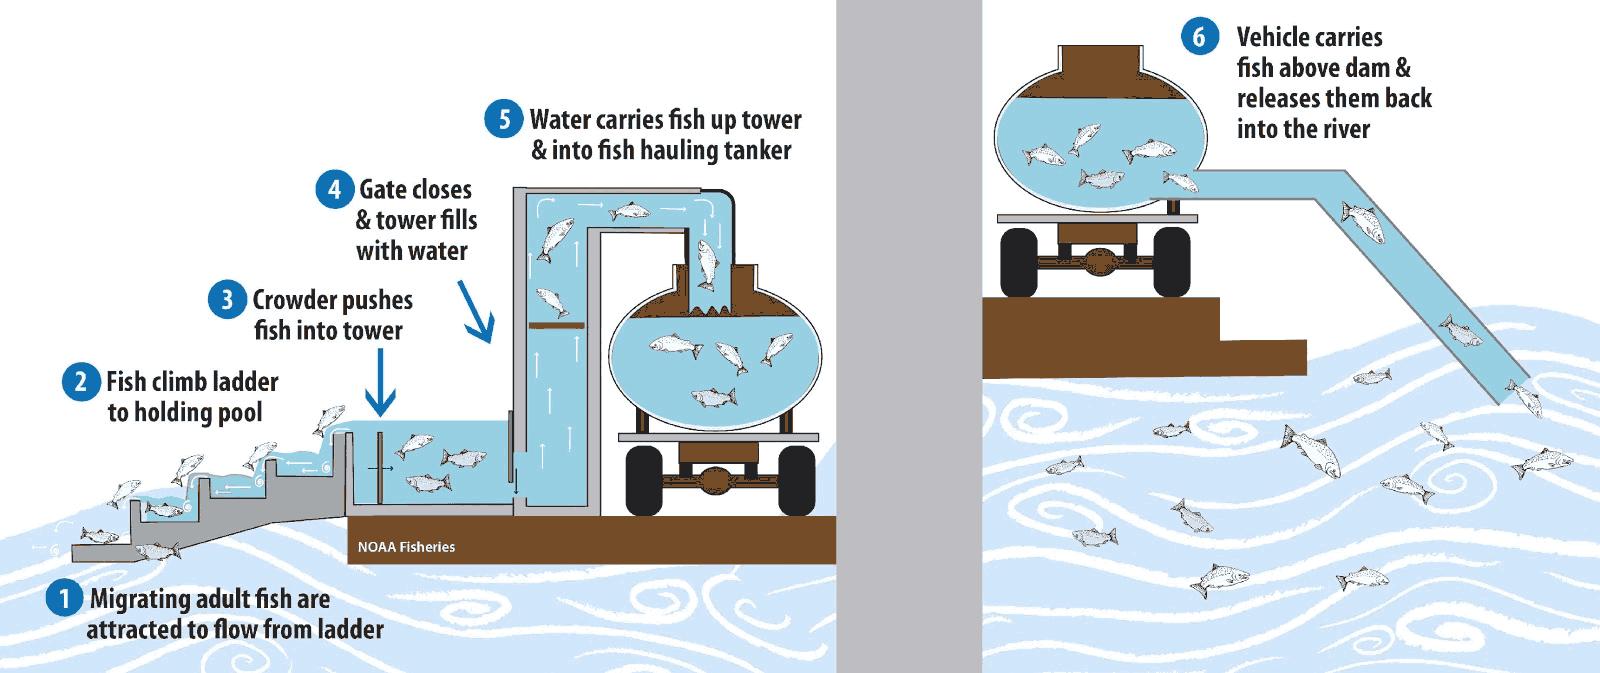 Diagram of fish passage technology using tanker trucks